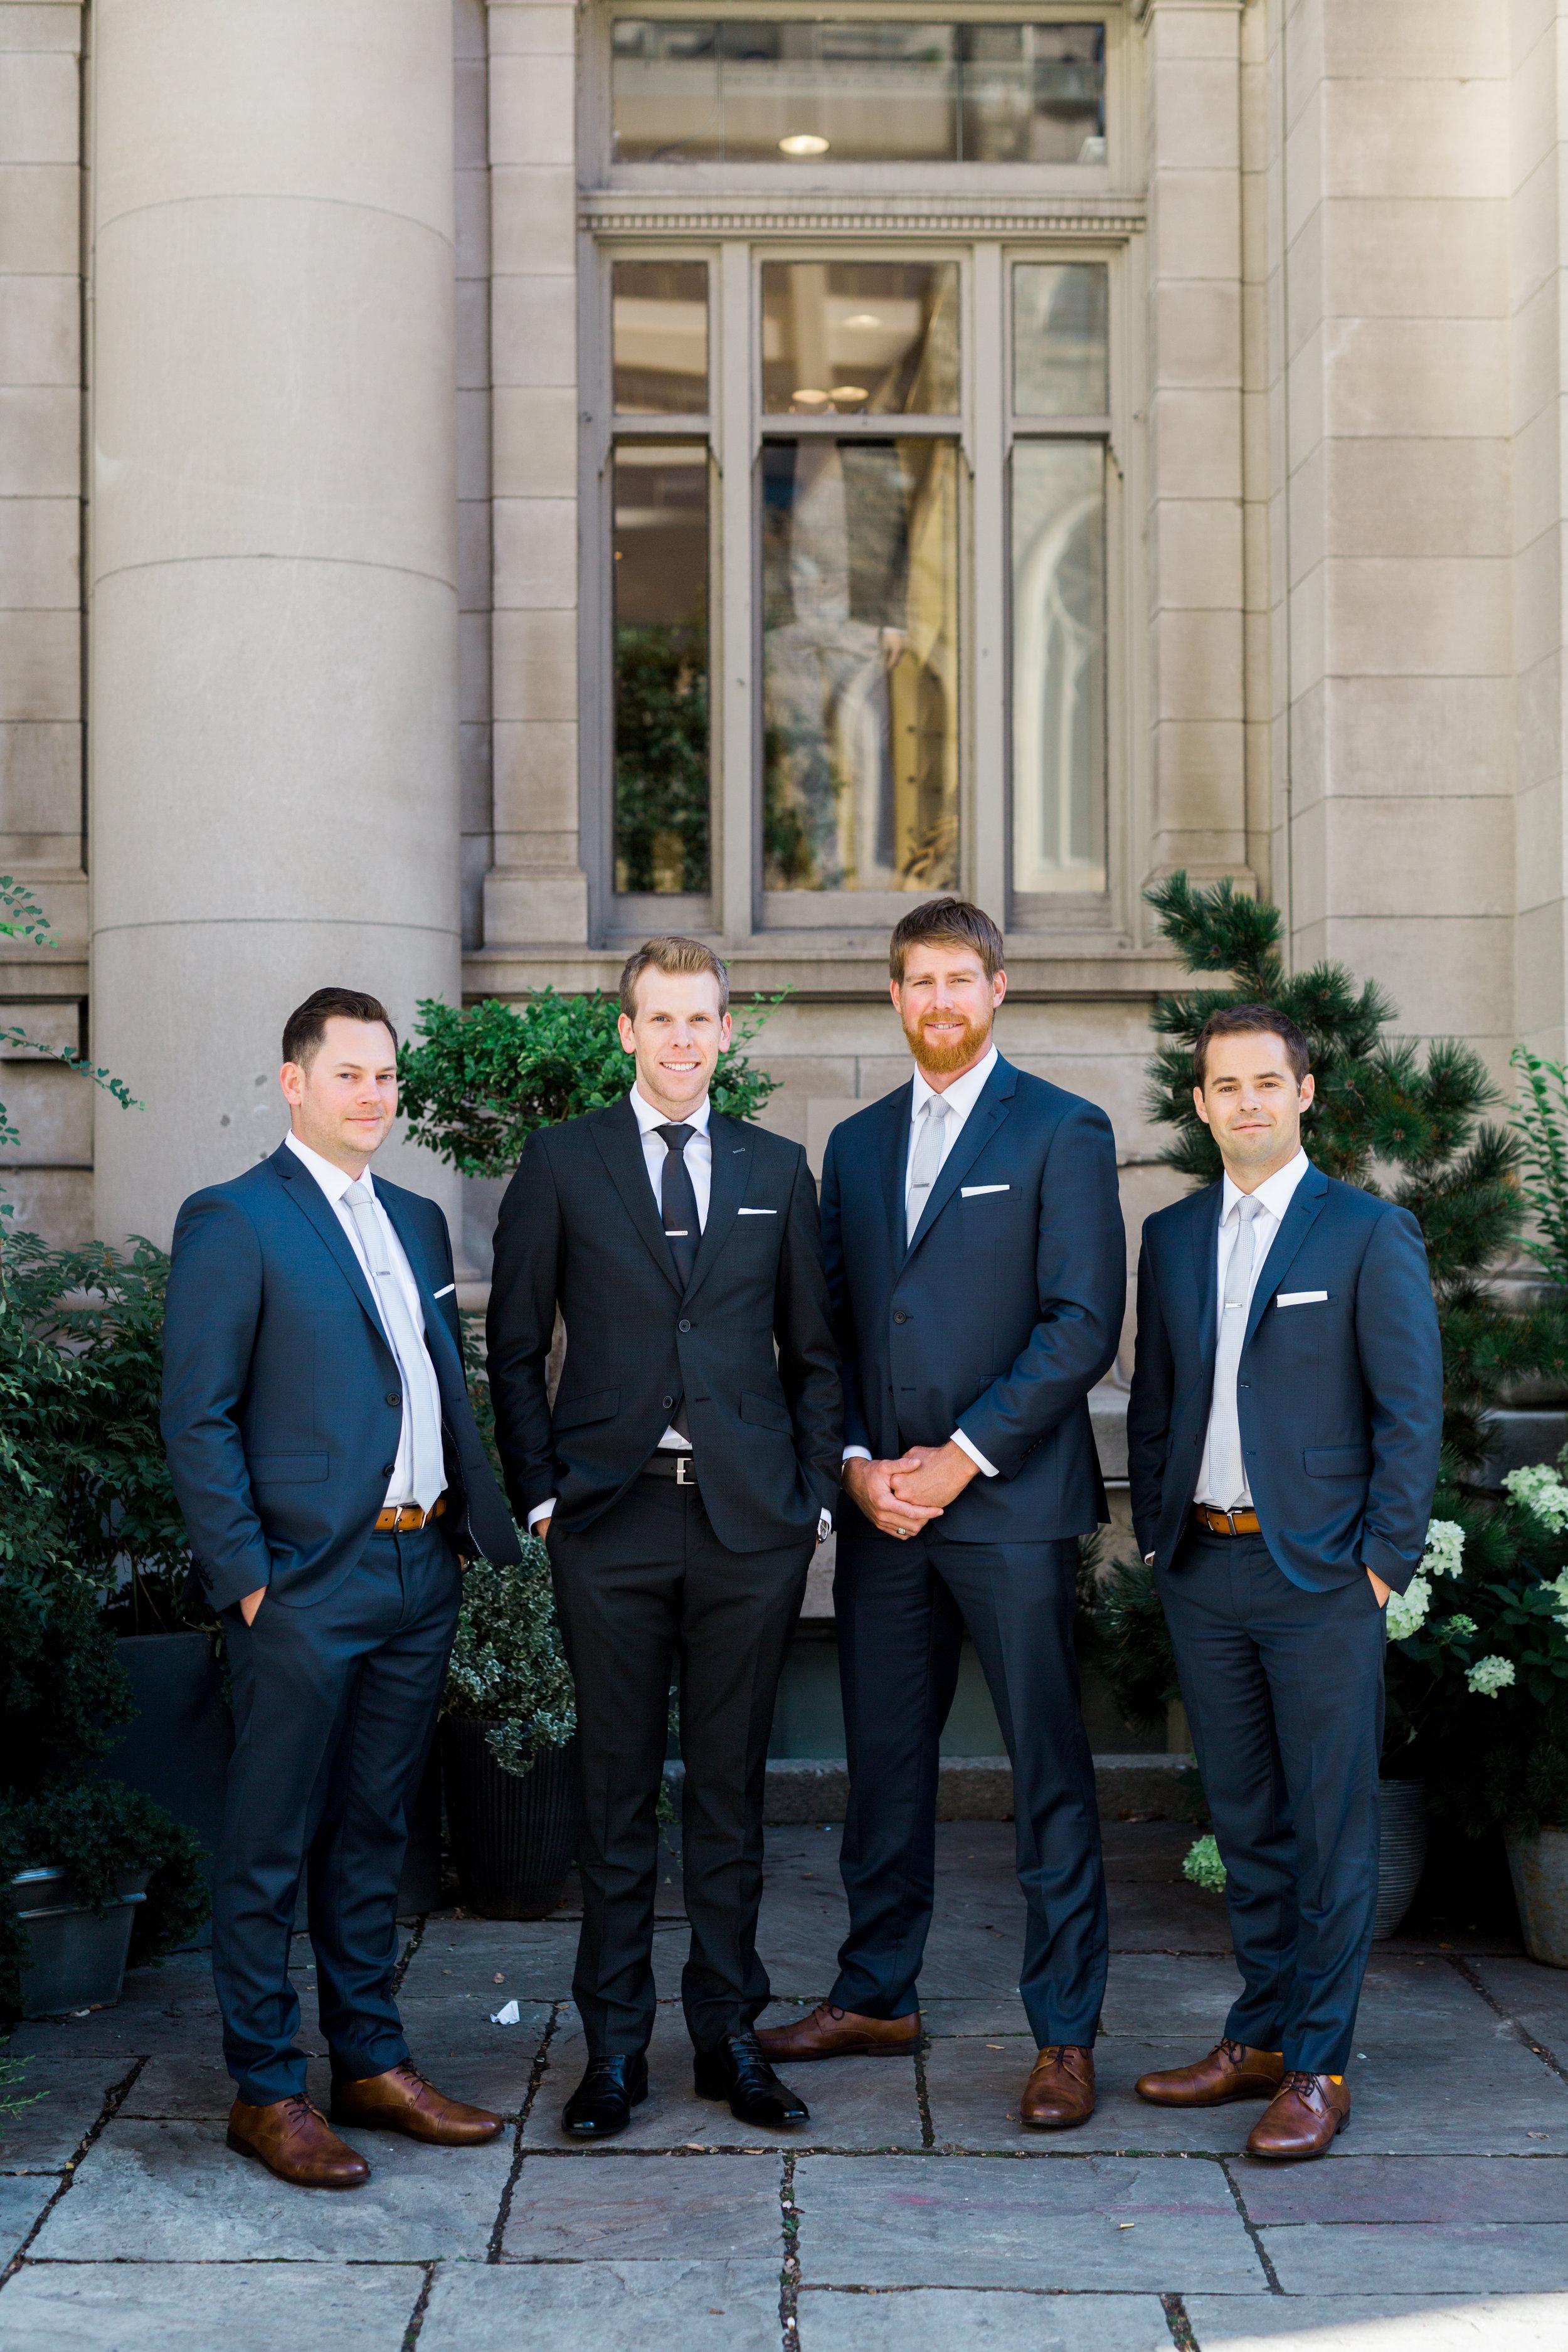 Toronto Fine Art Photographer - Yorkville Wedding - Bridal Party Portraits-22.jpg